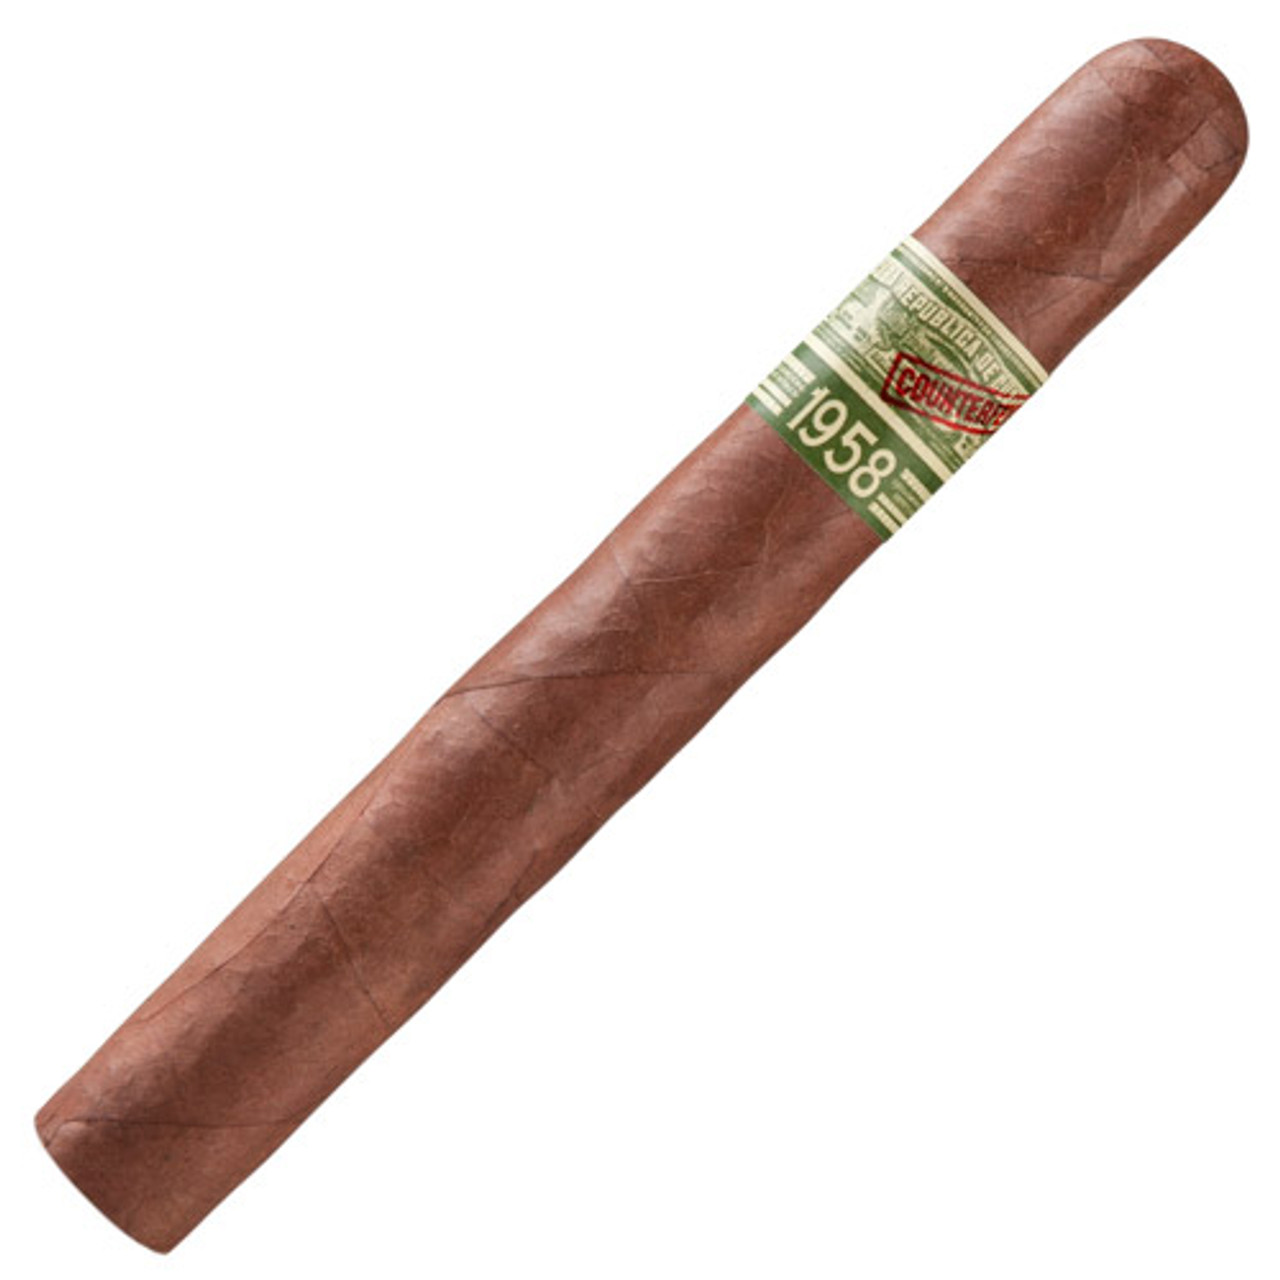 Genuine Pre-Embargo Counterfeit Cubans 1958 Corona Gorda Cigars - 6 x 50 (Pack of 5)